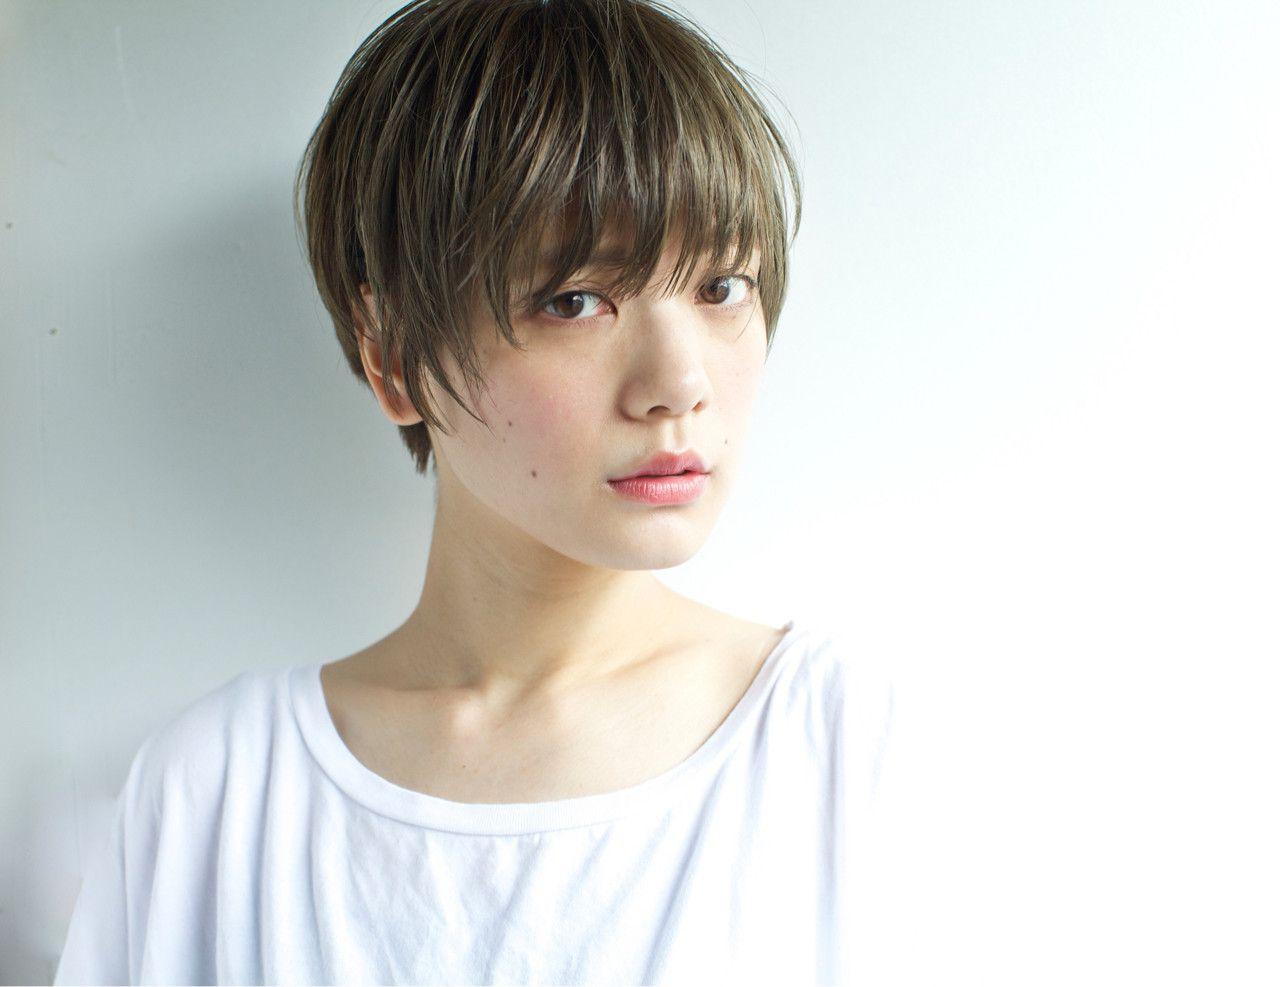 40 Stylish And Natural Taper Haircut 美髪 短い髪のためのヘア